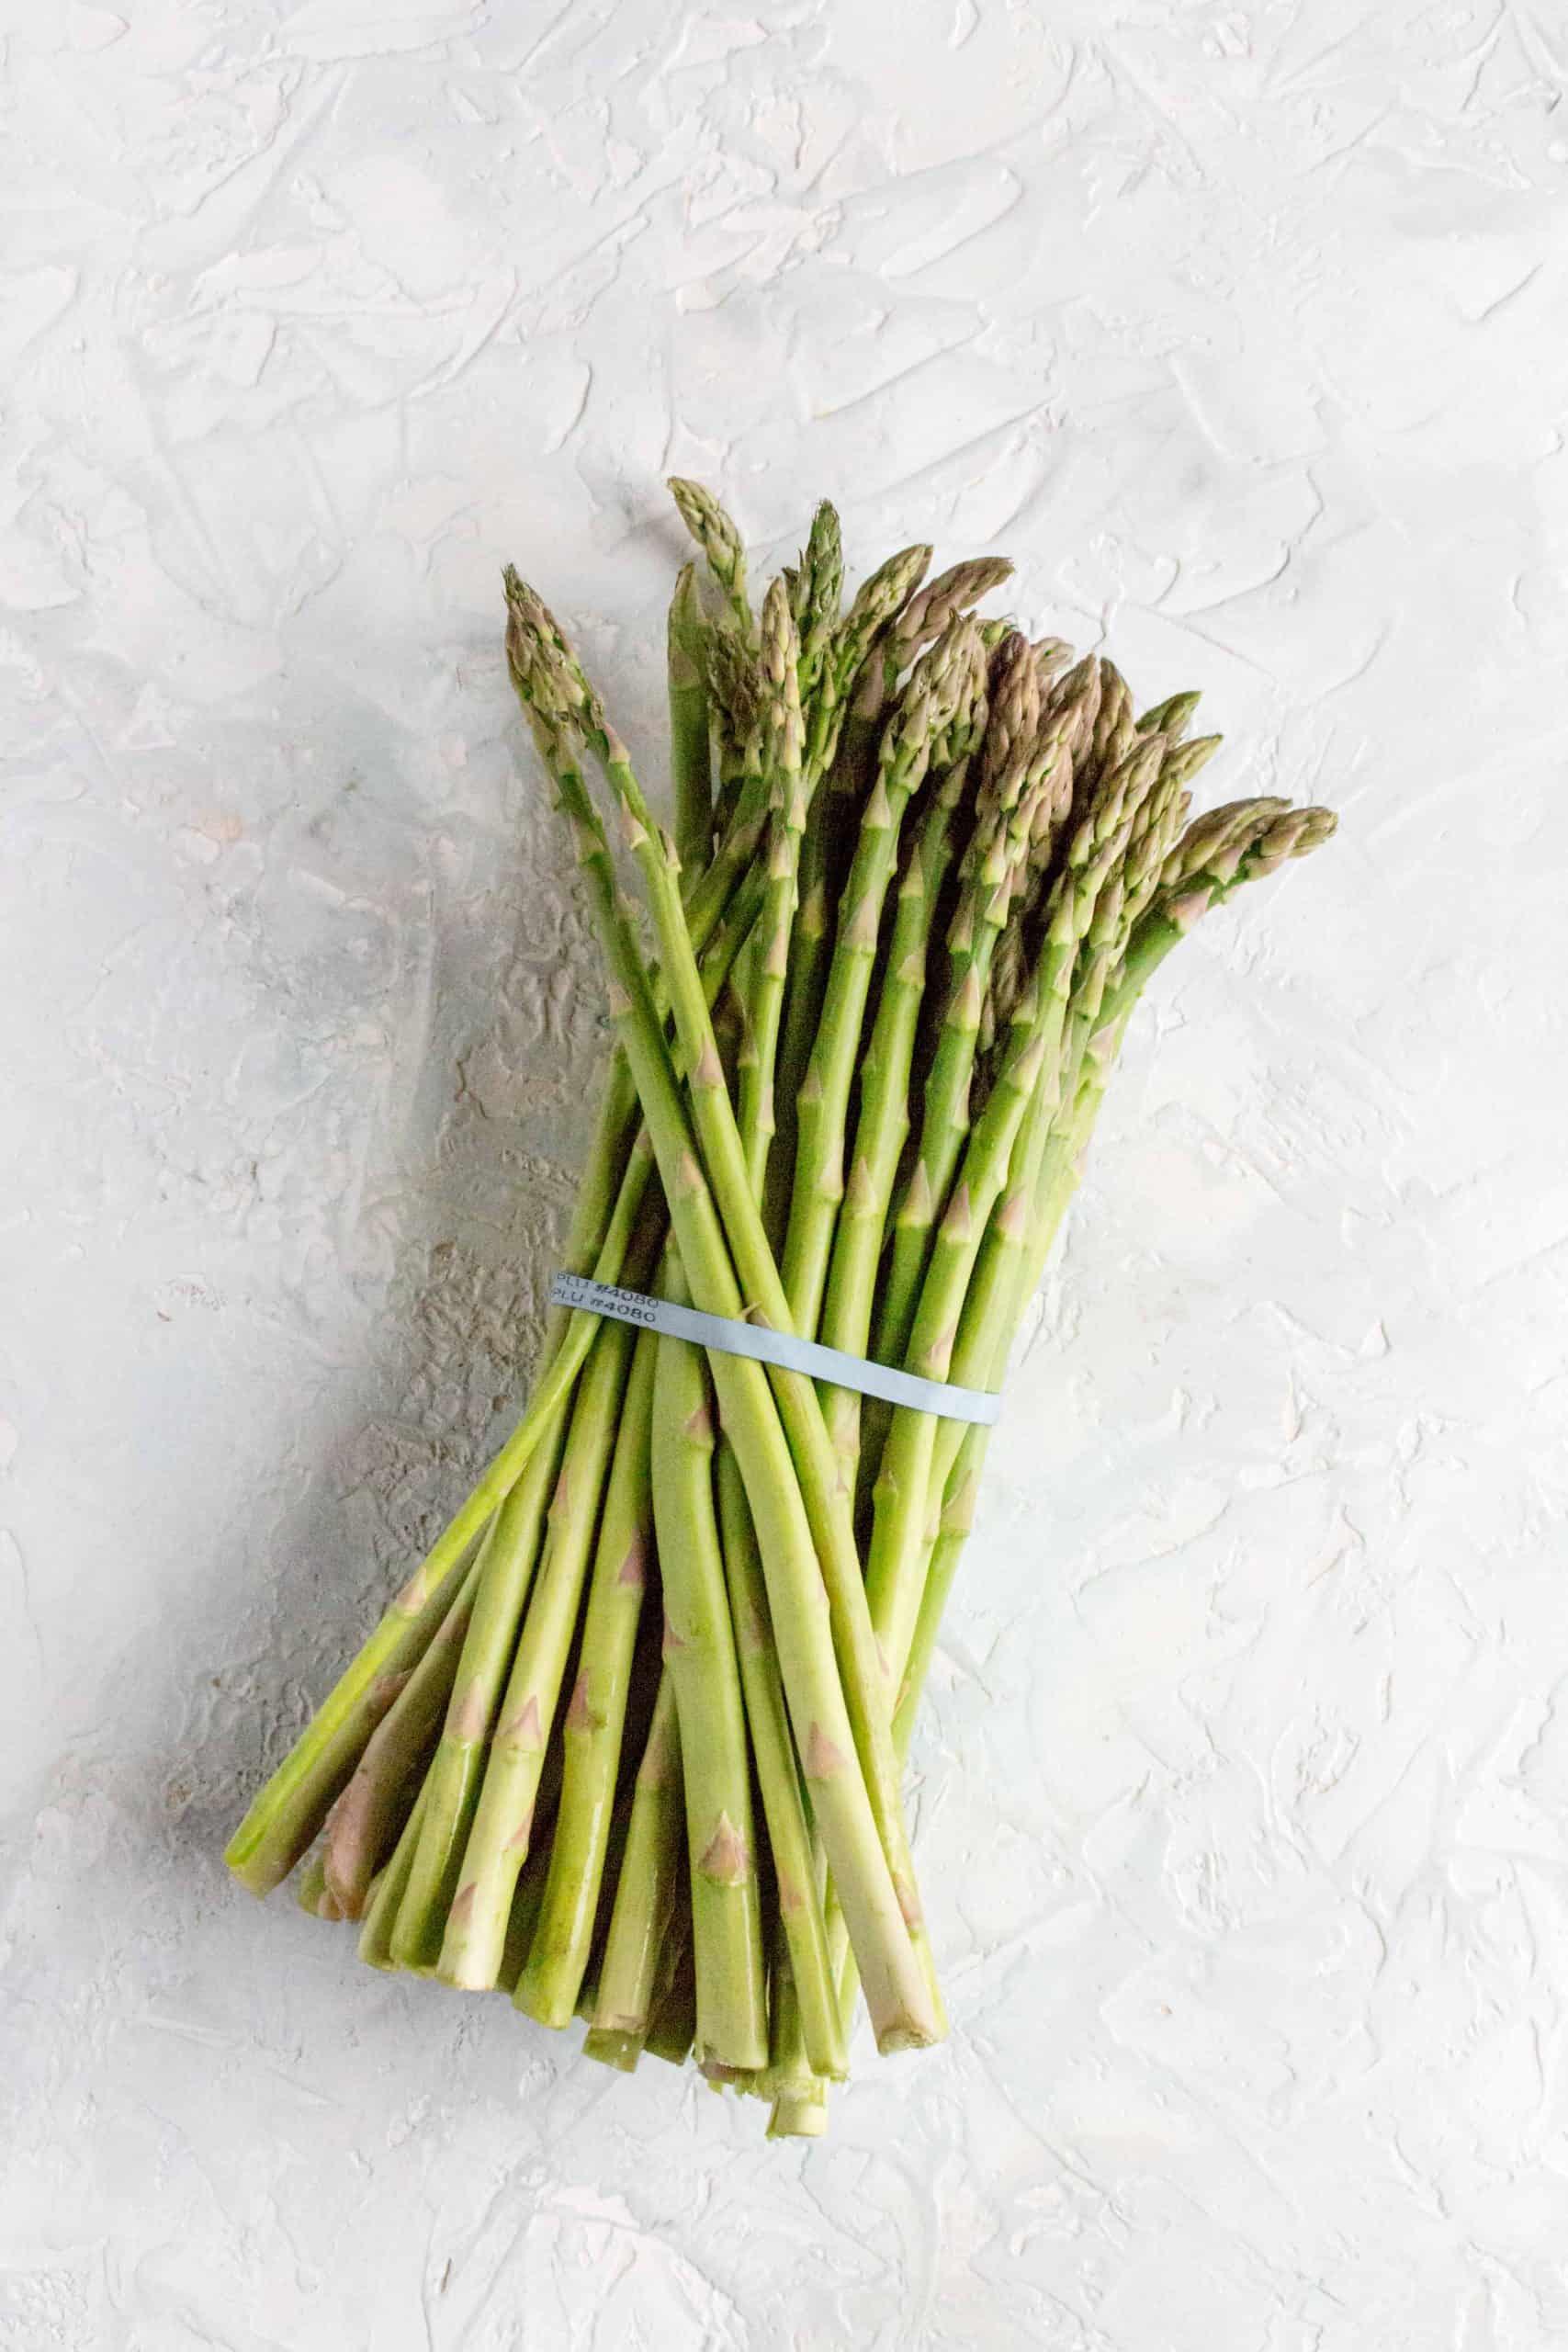 bunch of raw asparagus